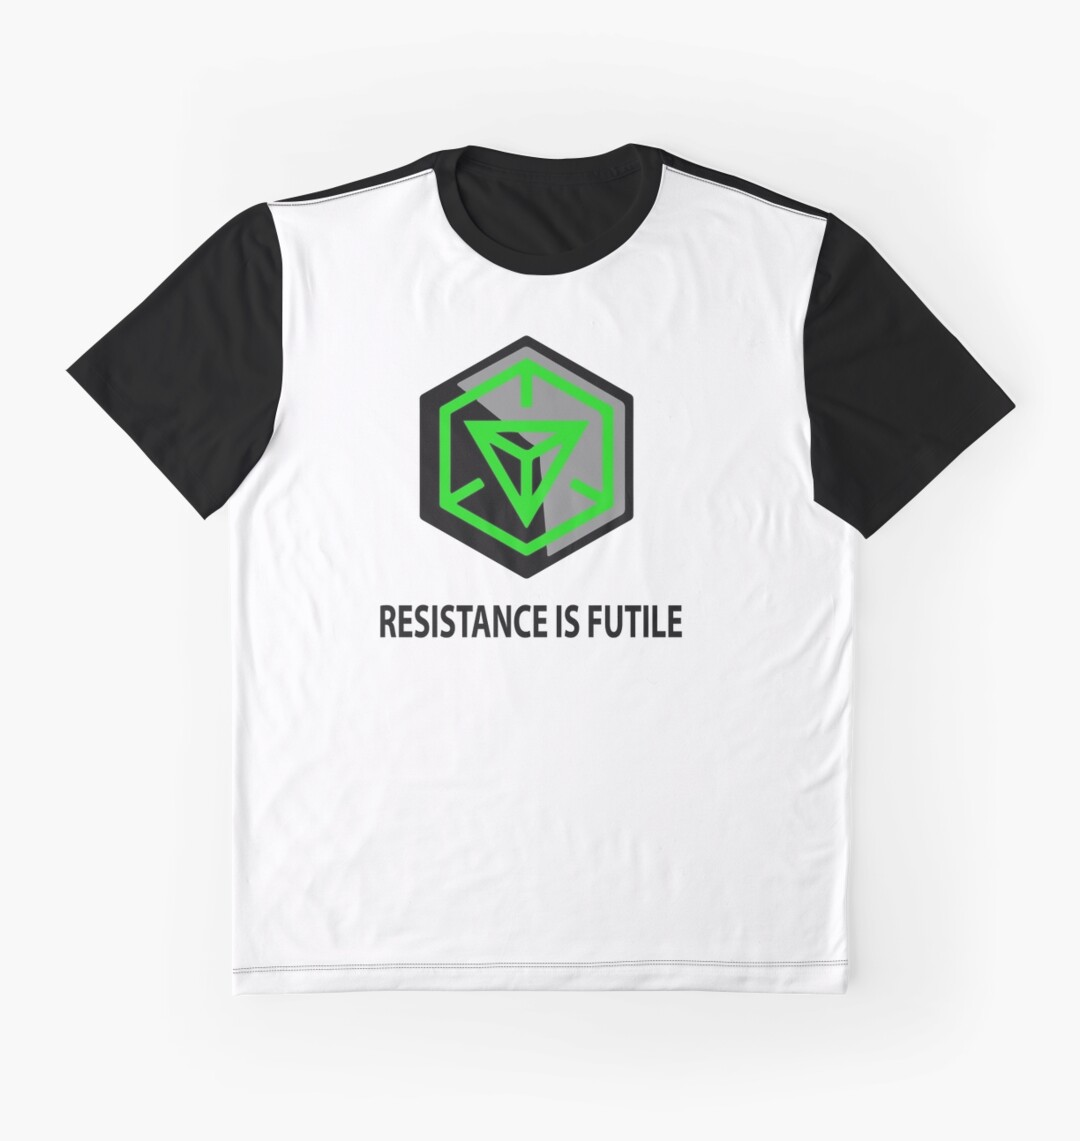 Design shirt redbubble - Resistance Is Futile Ingress Enlightened Design